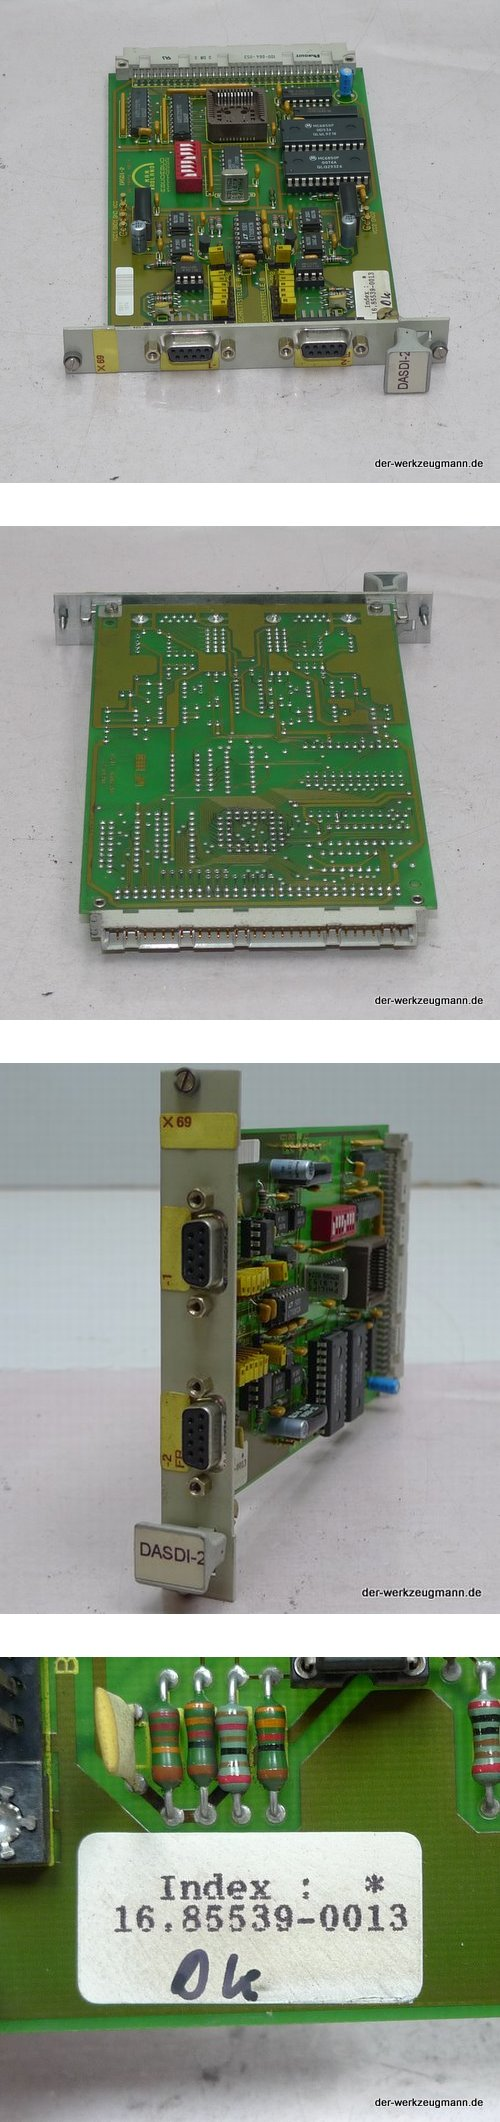 MAN Roland DASDI-2 Einbaukarte 16.85539-0013 ManRoland